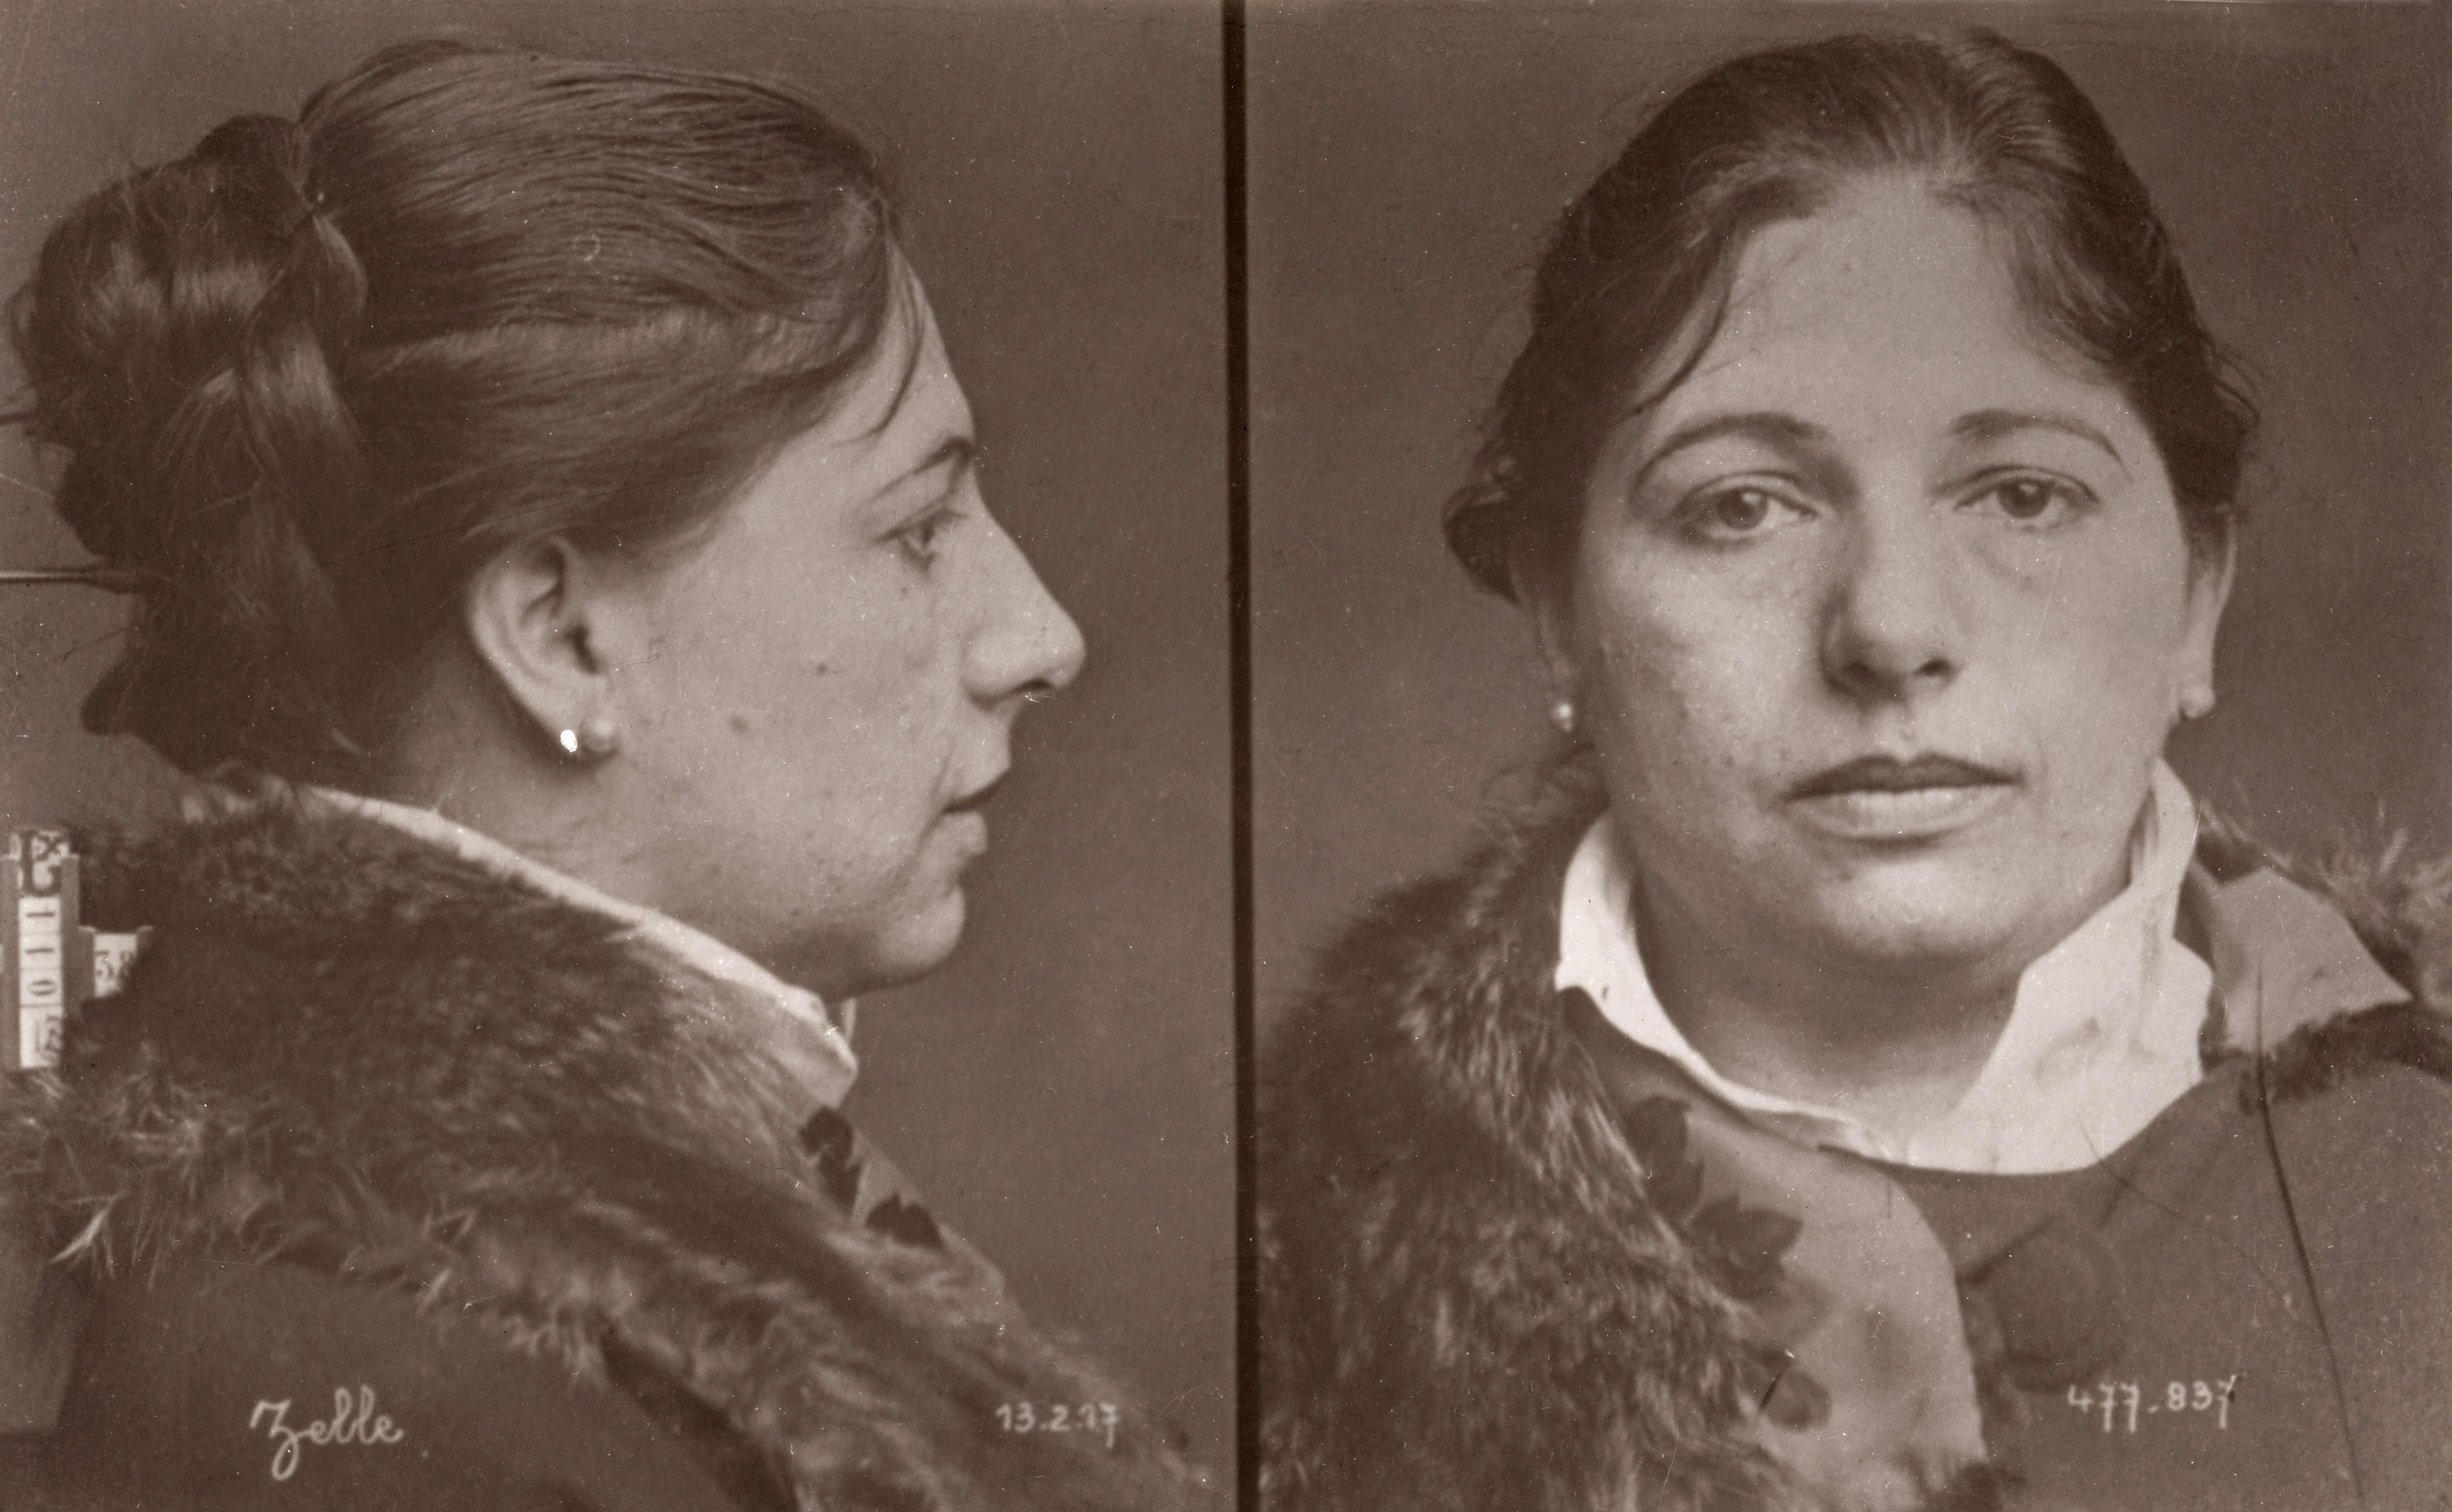 1917_02_13-mugshot-mata-hari-m-zelle